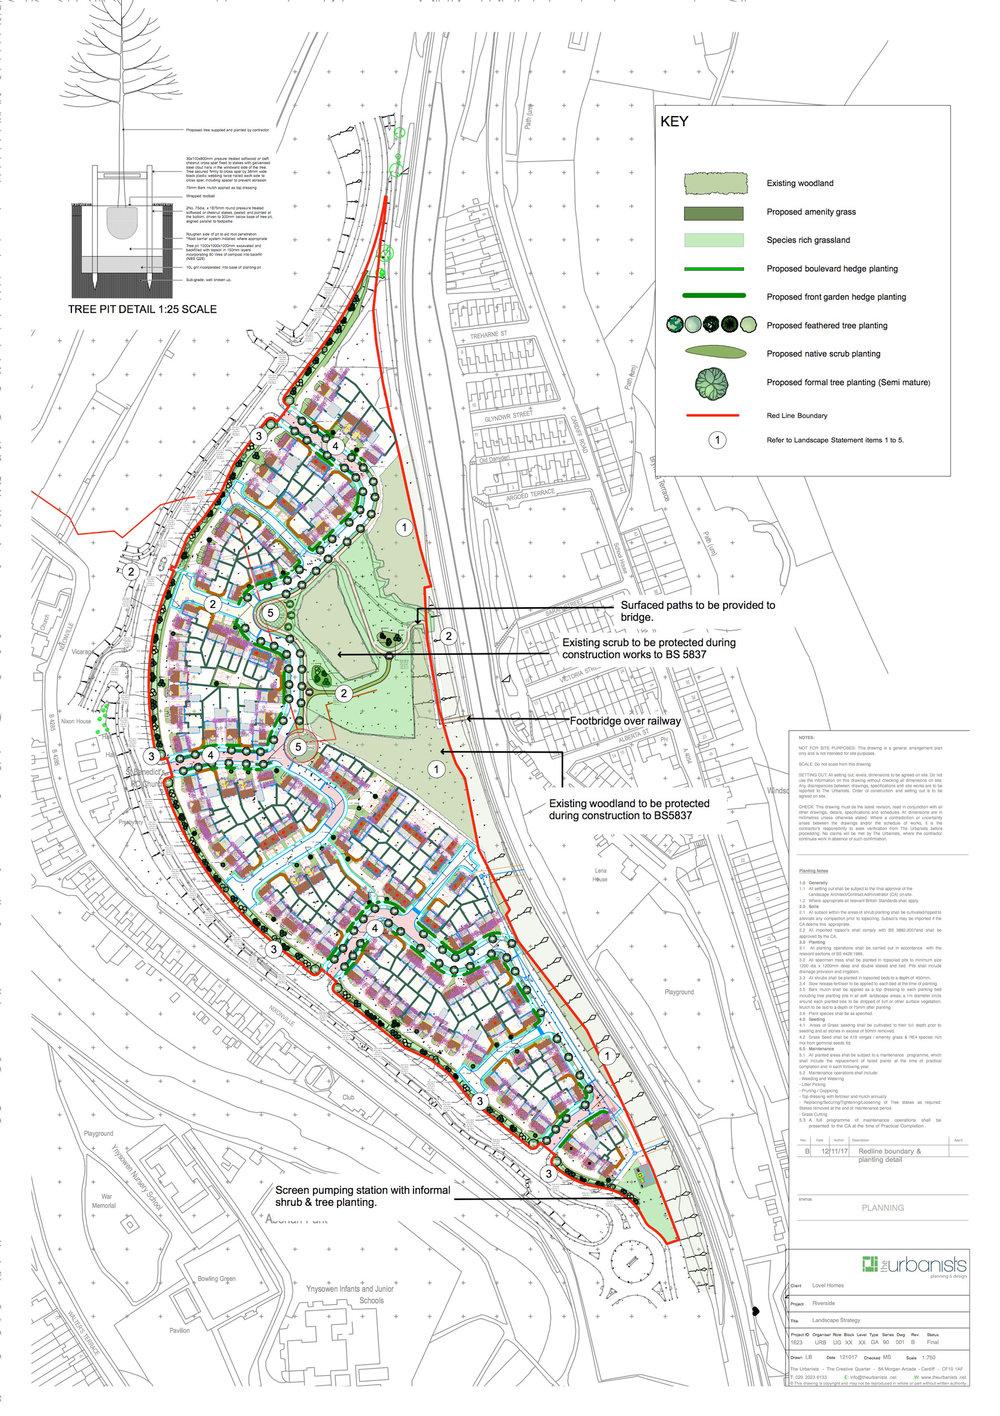 1623-URB-LA-XX-XX-GA-(90)-01-Riverside-development.jpg